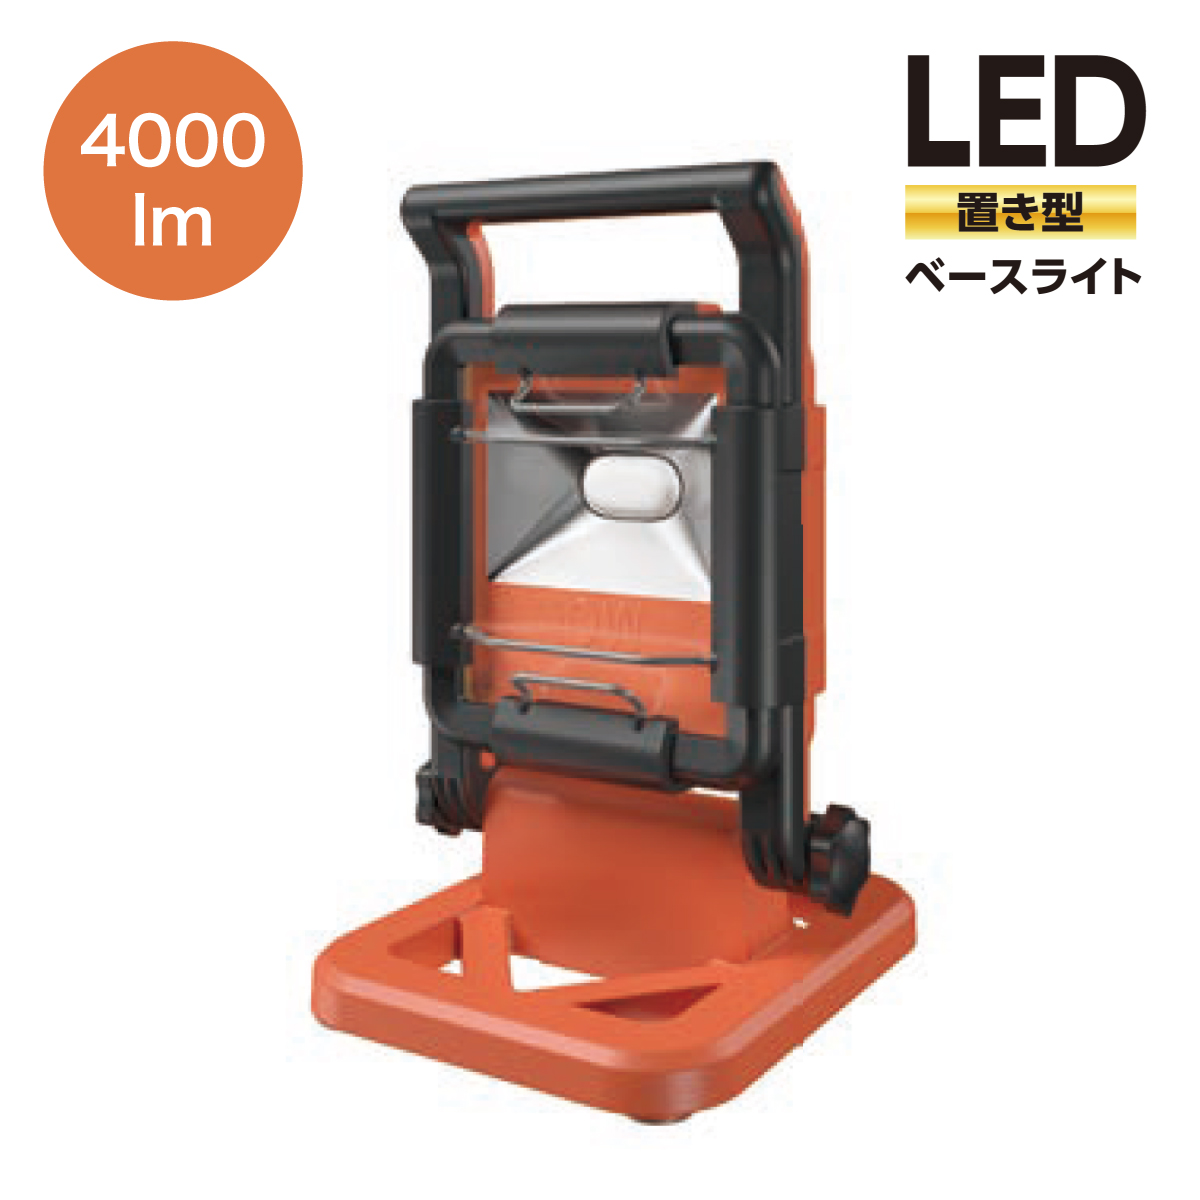 LEDベースライト ワークライト 商品 販売実績No.1 照明 省電力 長寿命 防水 4000lm ブルズLEDワークライトシリーズ LWT-4000BA LEDスタンドライト 防塵 ライト